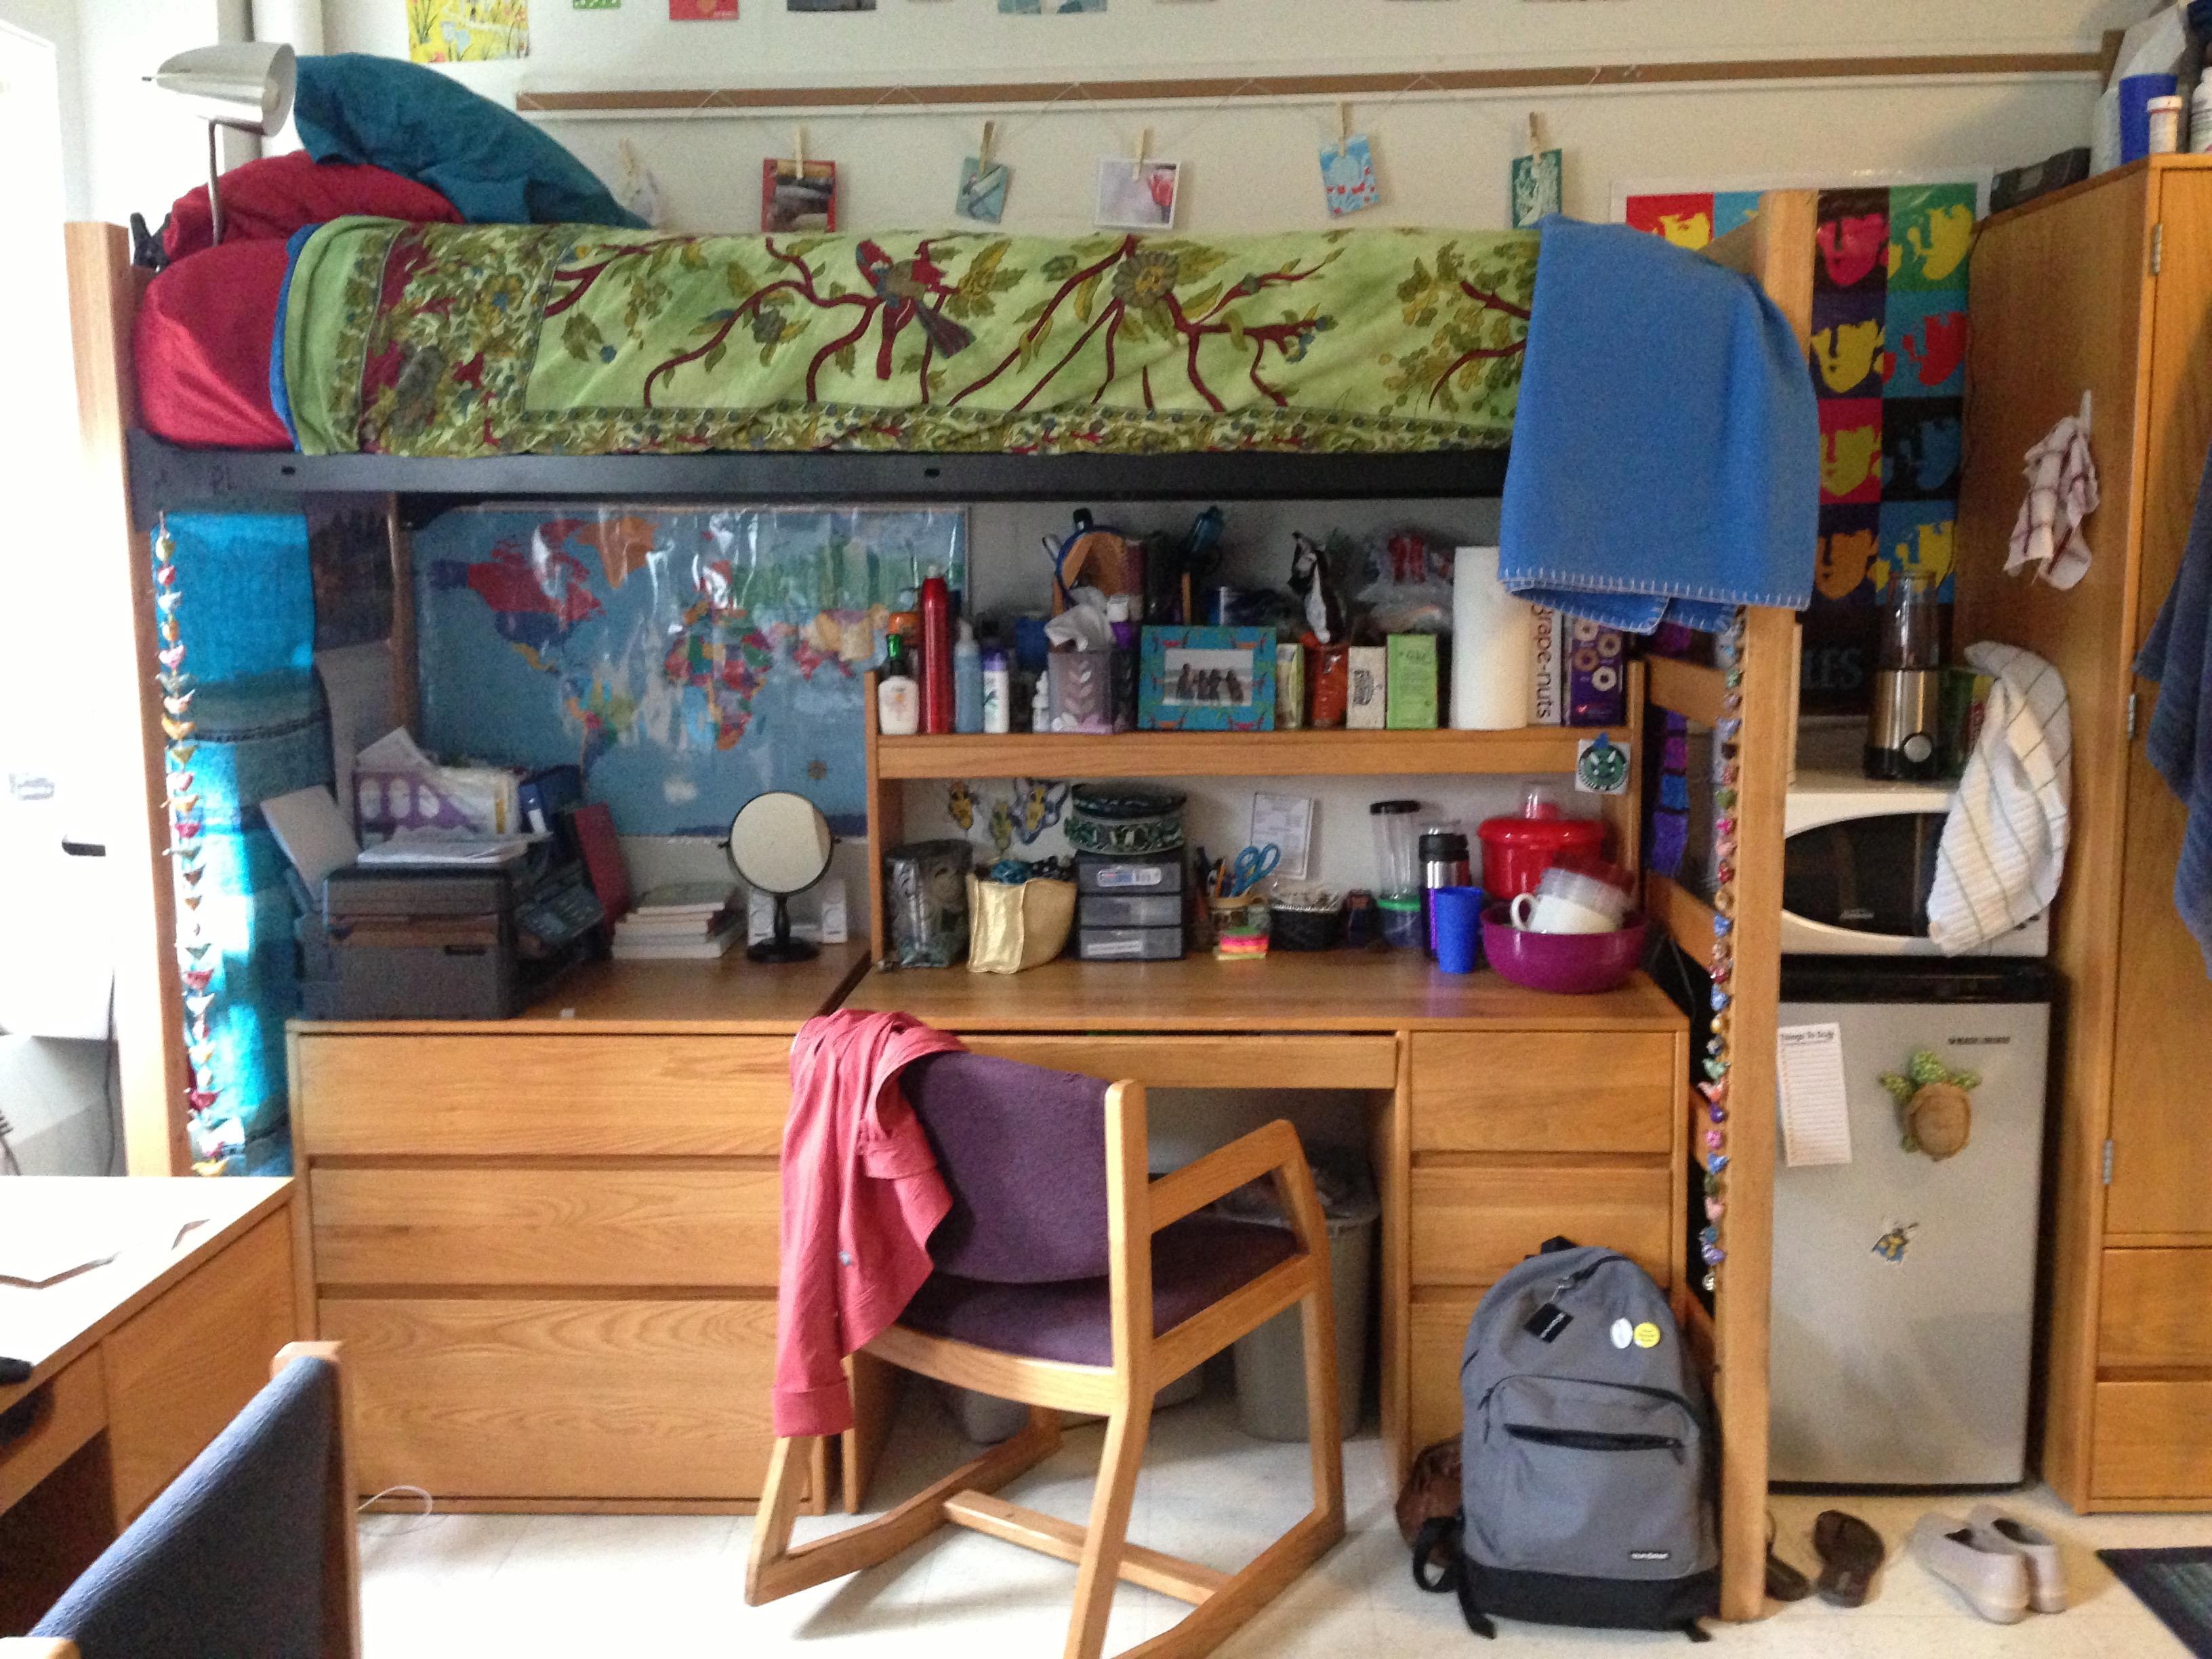 Freshman year dorm